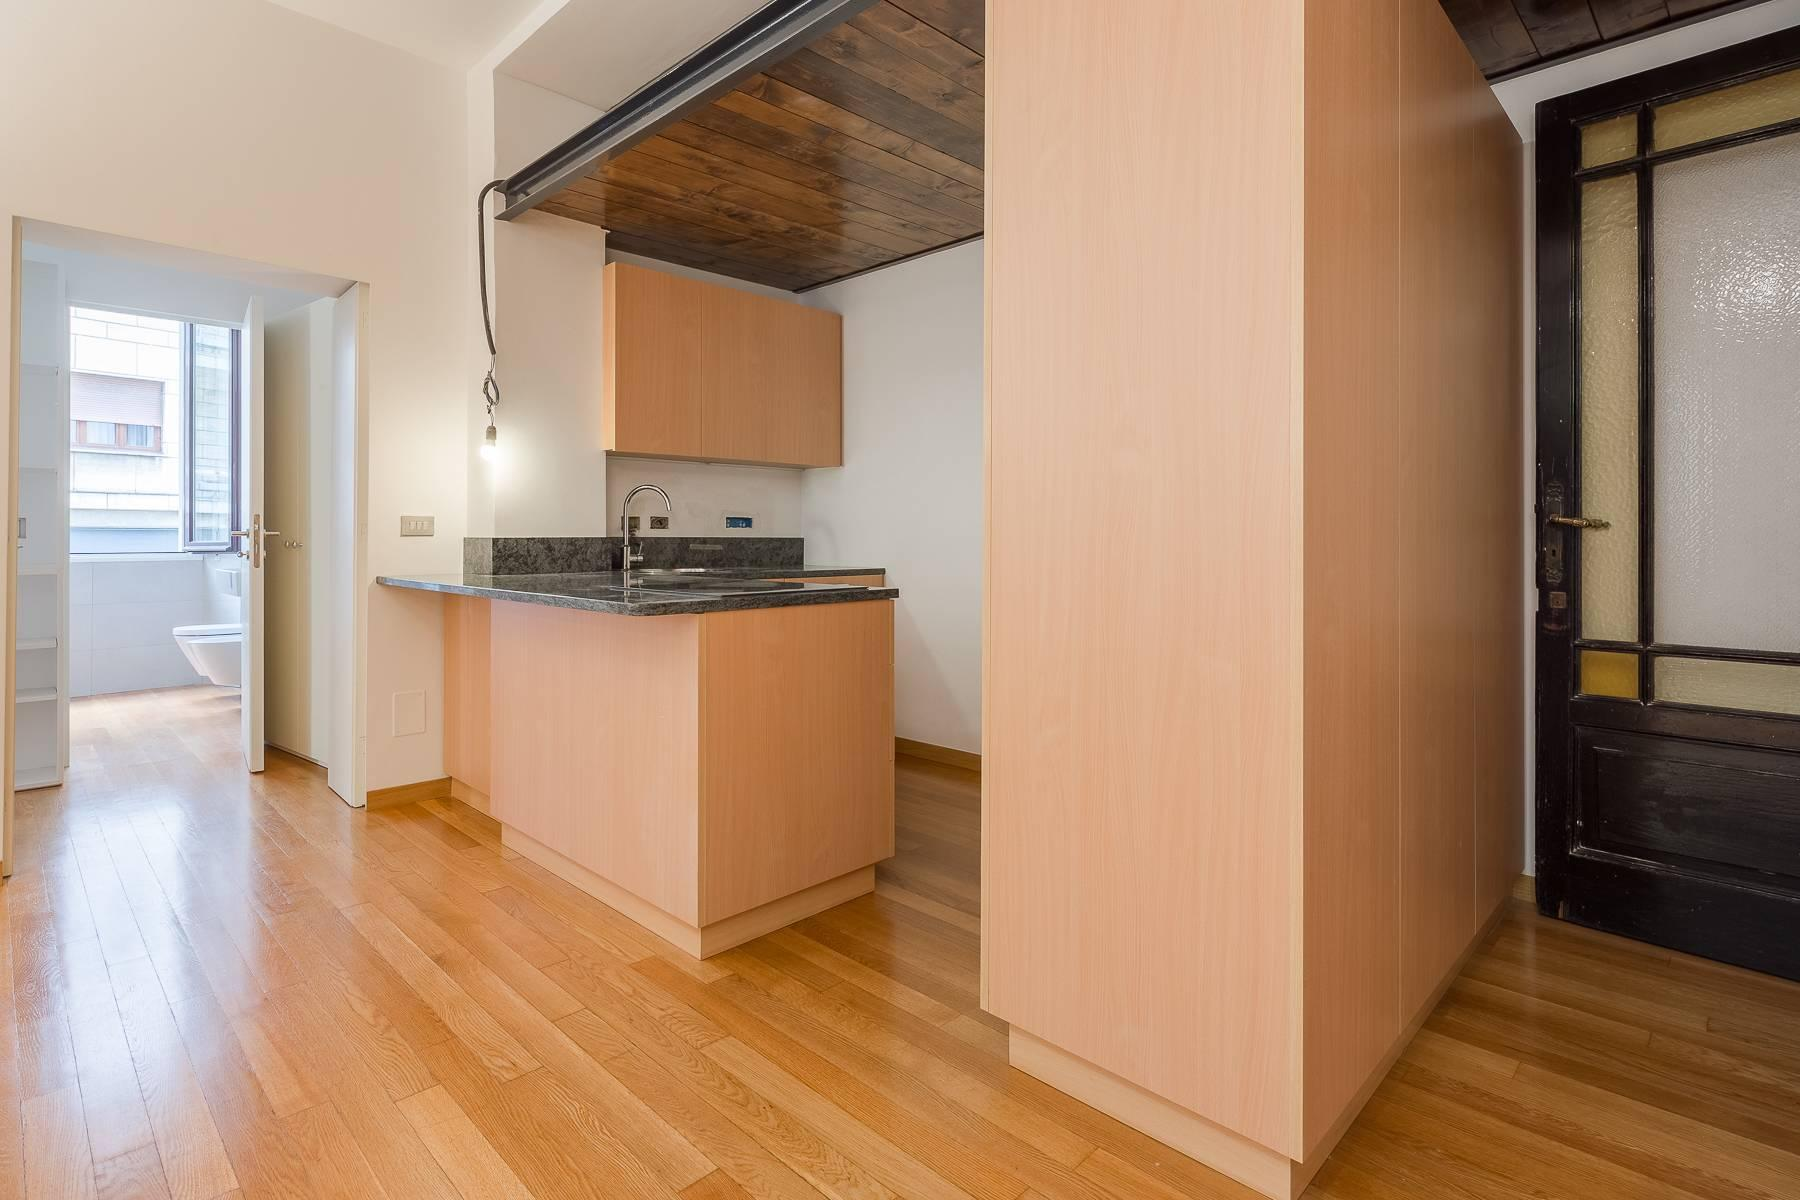 Apartment in an elegant period building located in a prestigious city district - 16